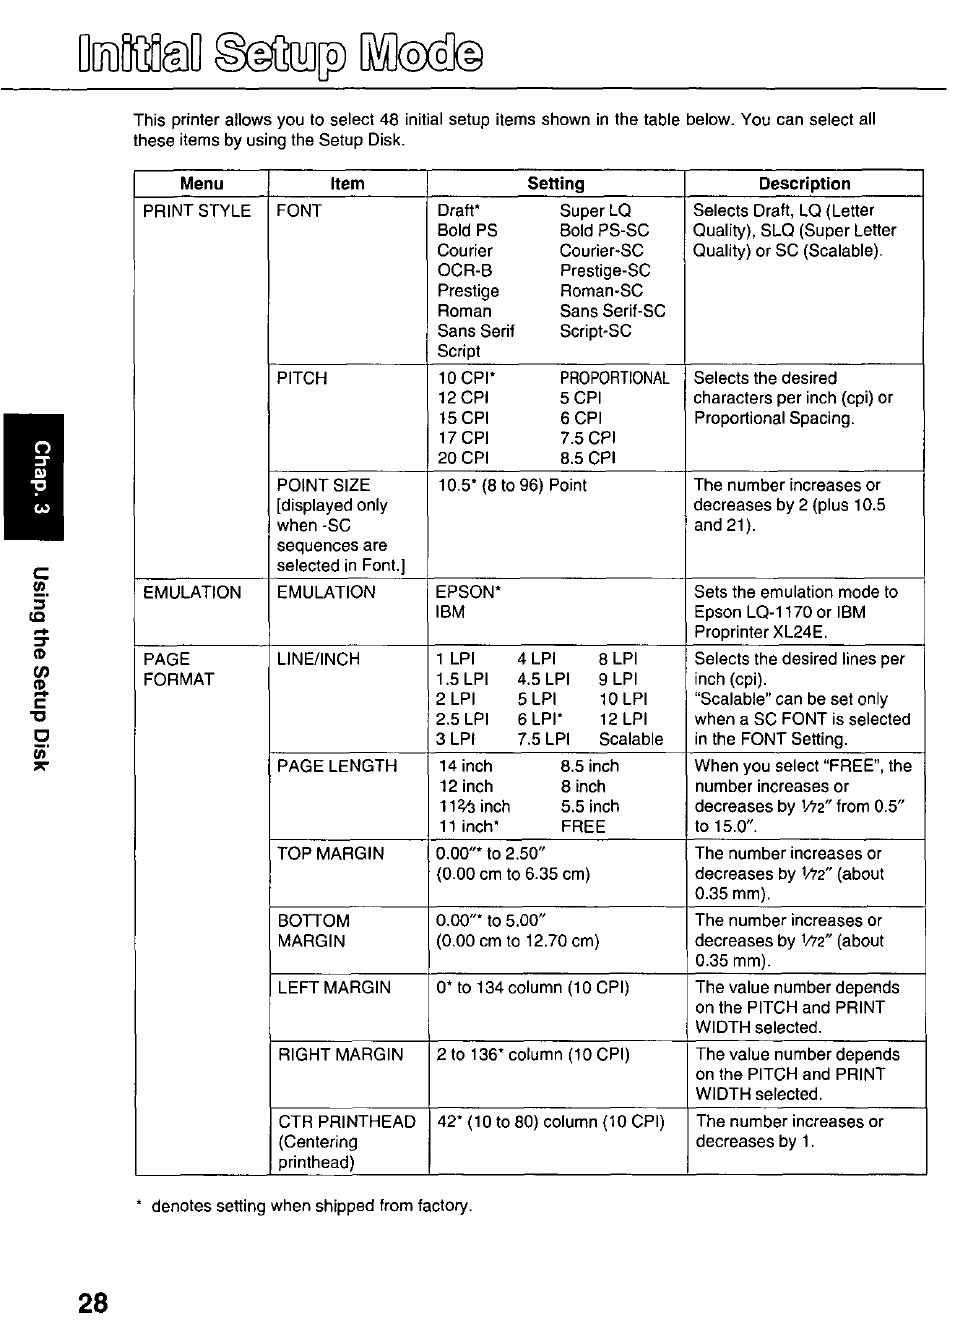 menu item setting panasonic kx p3626 user manual page 28 76 rh manualsdir com Panasonic Kx Instruction Manual Panasonic Owner's Manual